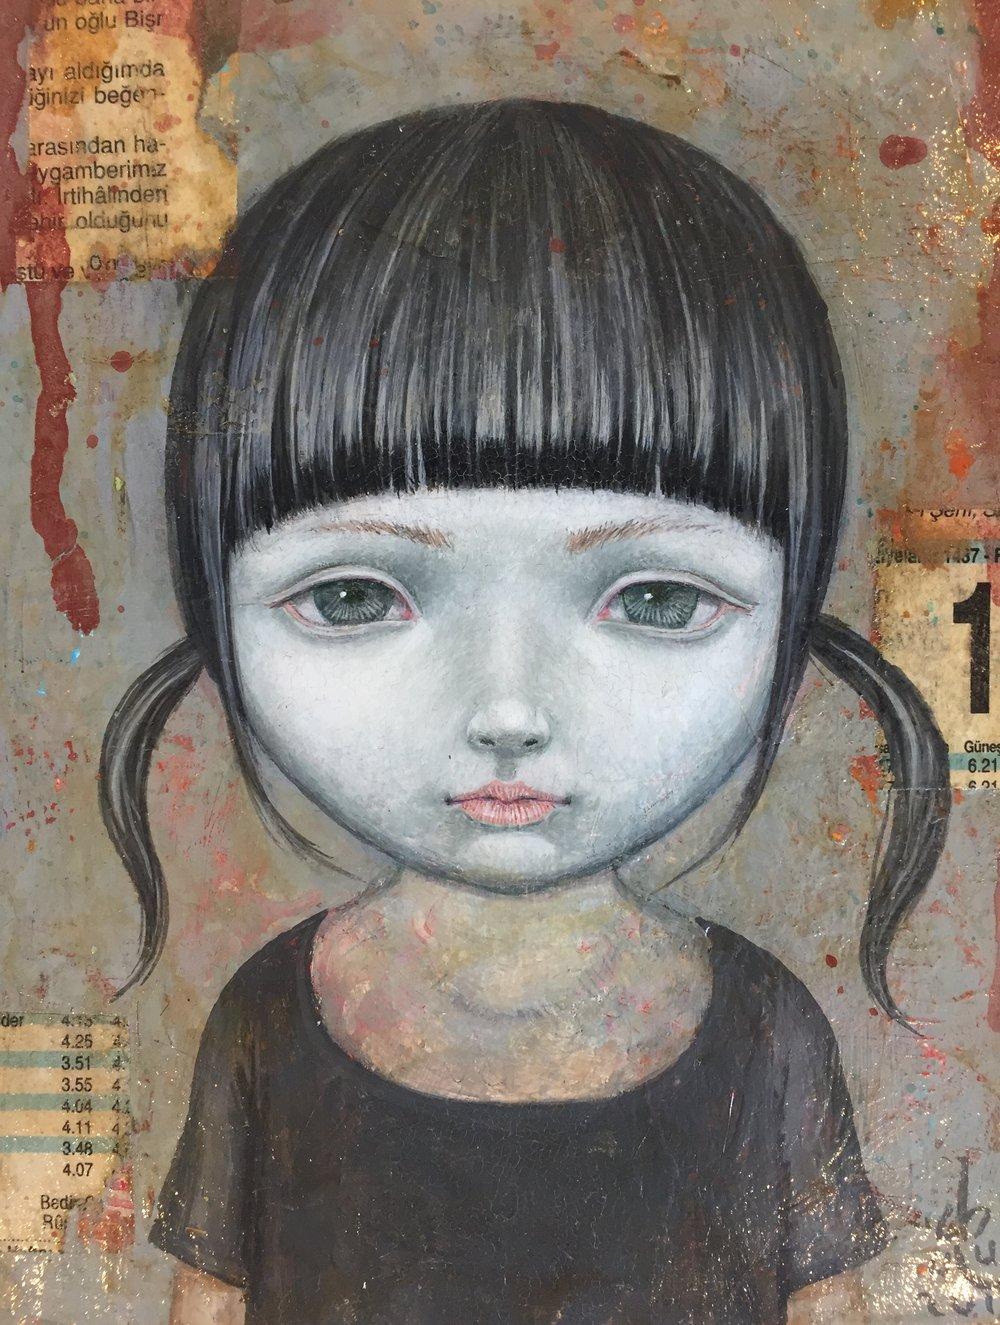 Gouache, aquarel & acryl op karton met vernislaag - 16 x 18,5 cm